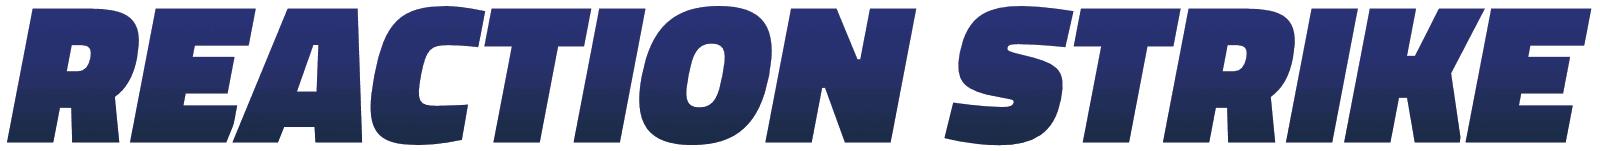 Reaction Strike Logo